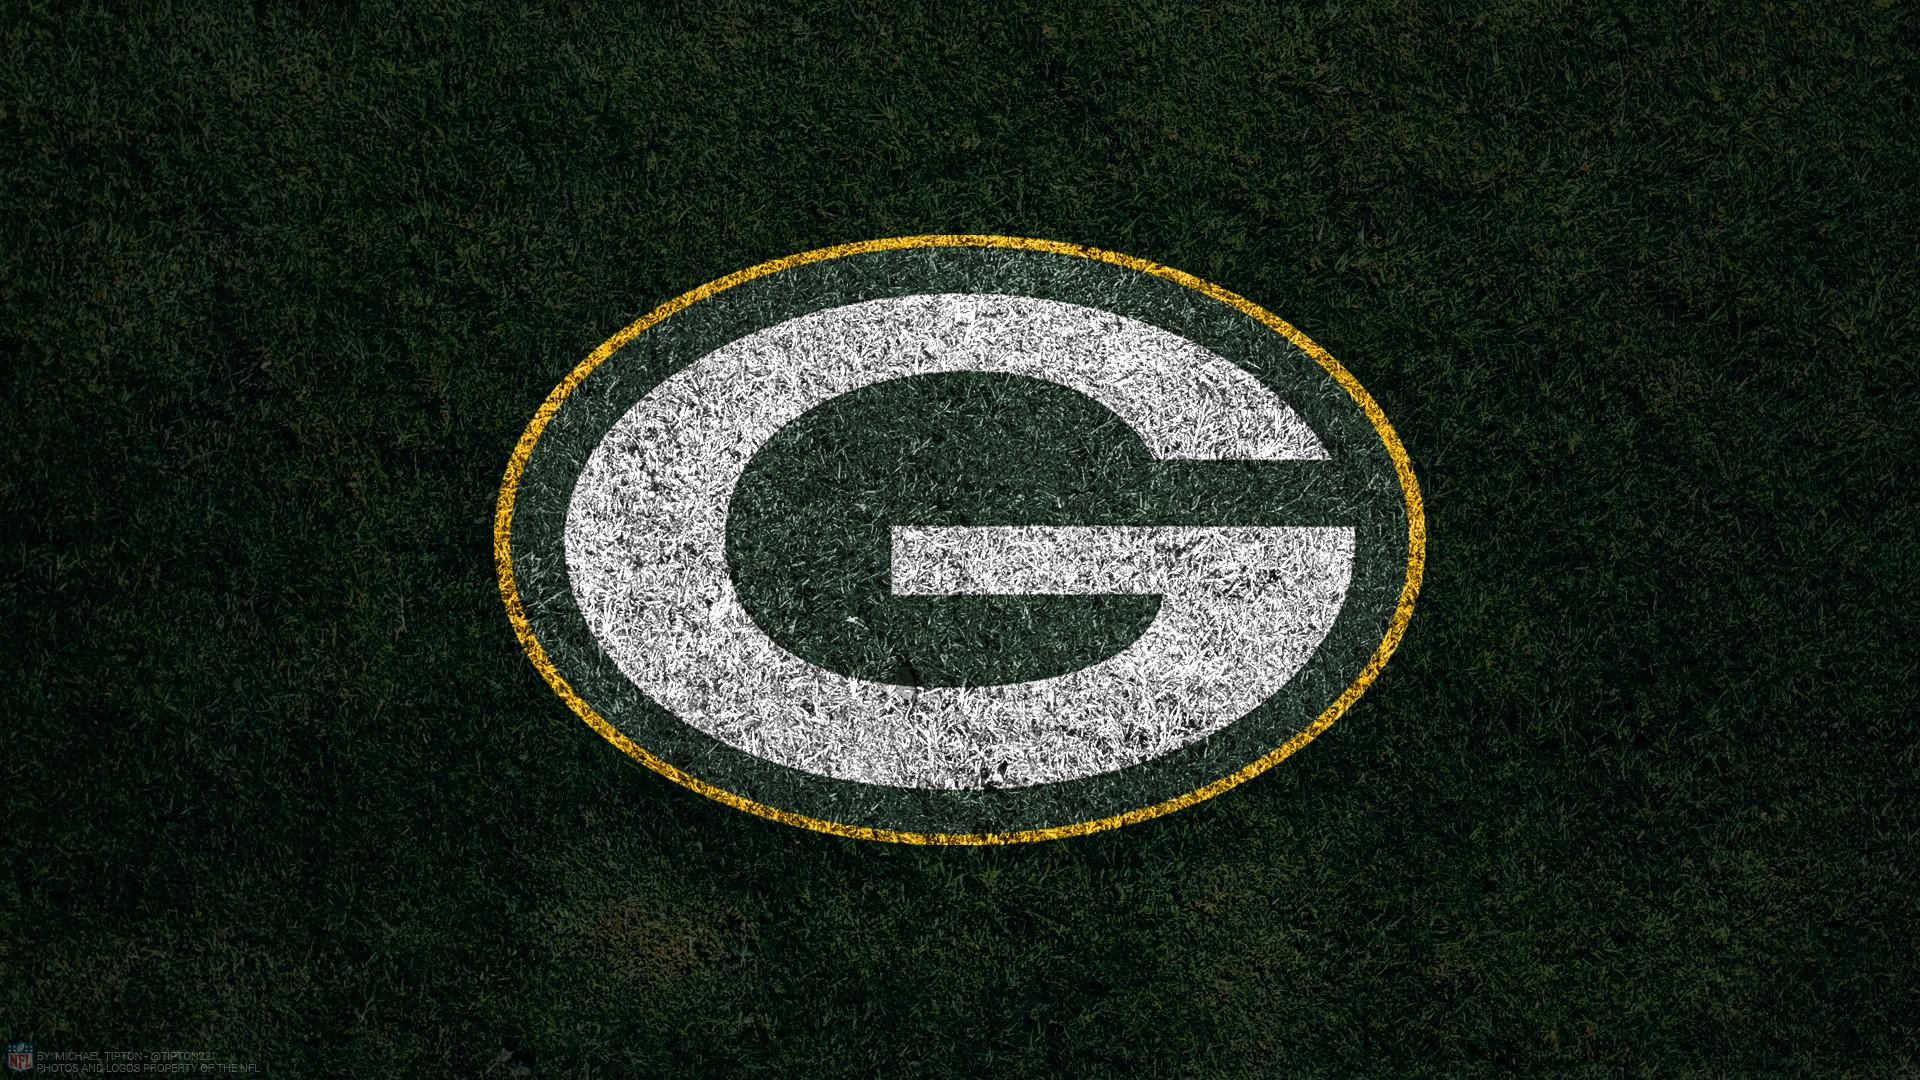 Green Bay Packers Iphone X Wallpaper Green Bay Packers Wallpapers 183 ① Wallpapertag